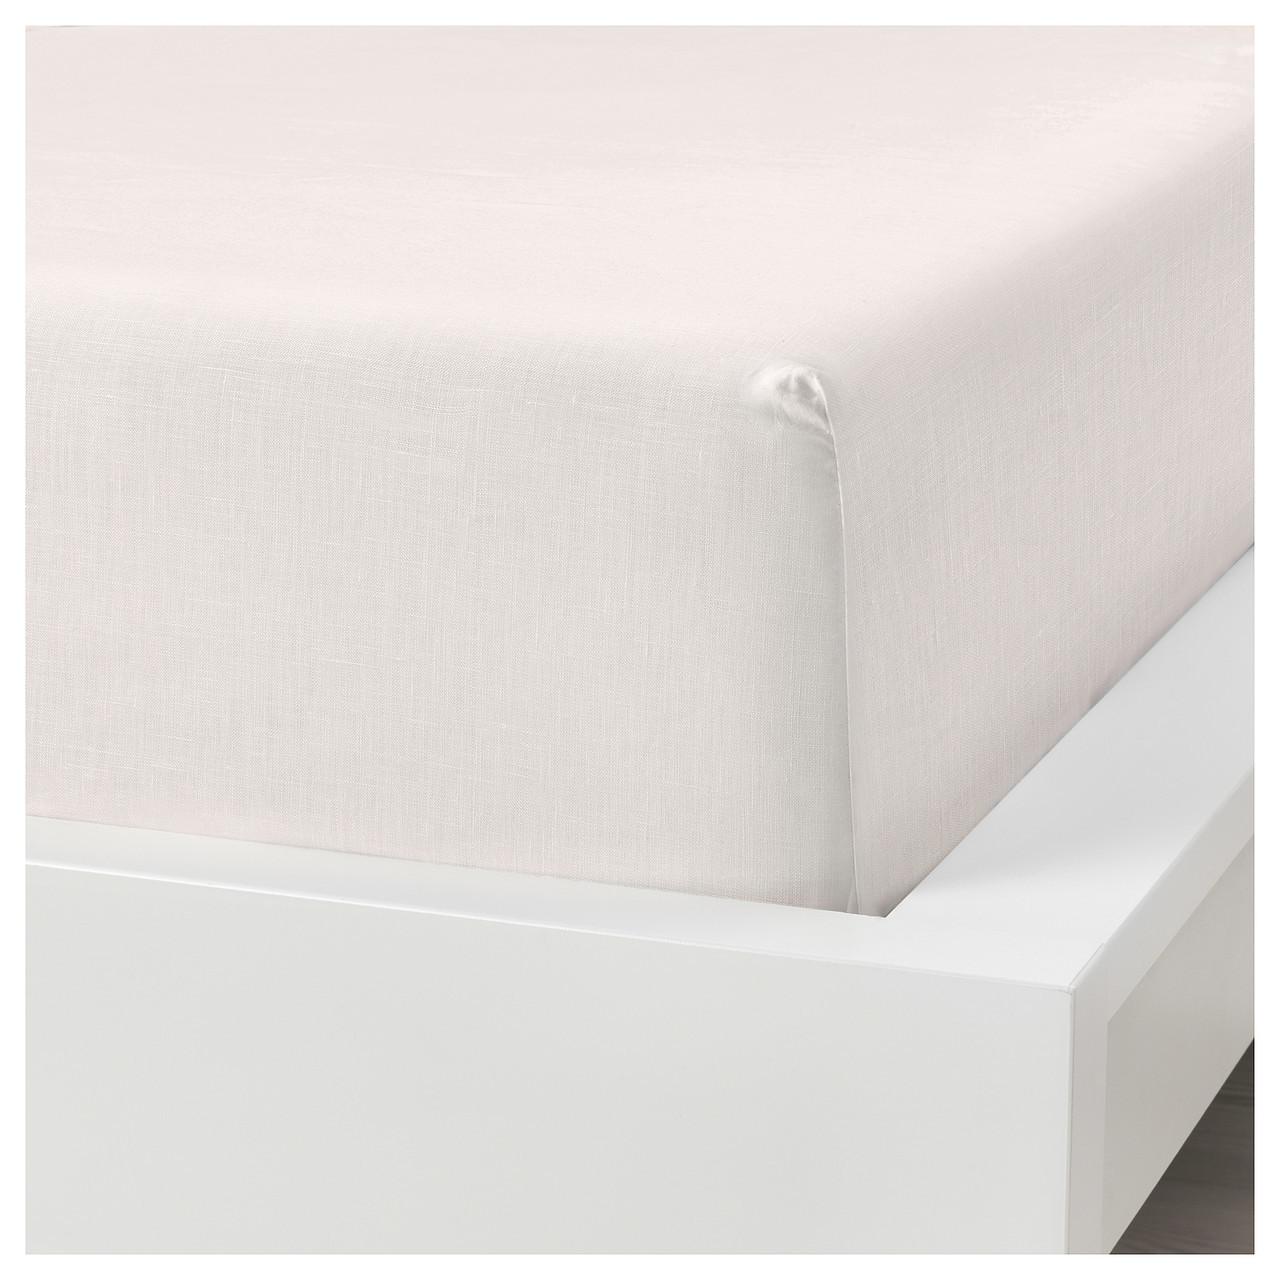 Простыня на резинке IKEA PUDERVIVA 160х200 см белая 903.984.68